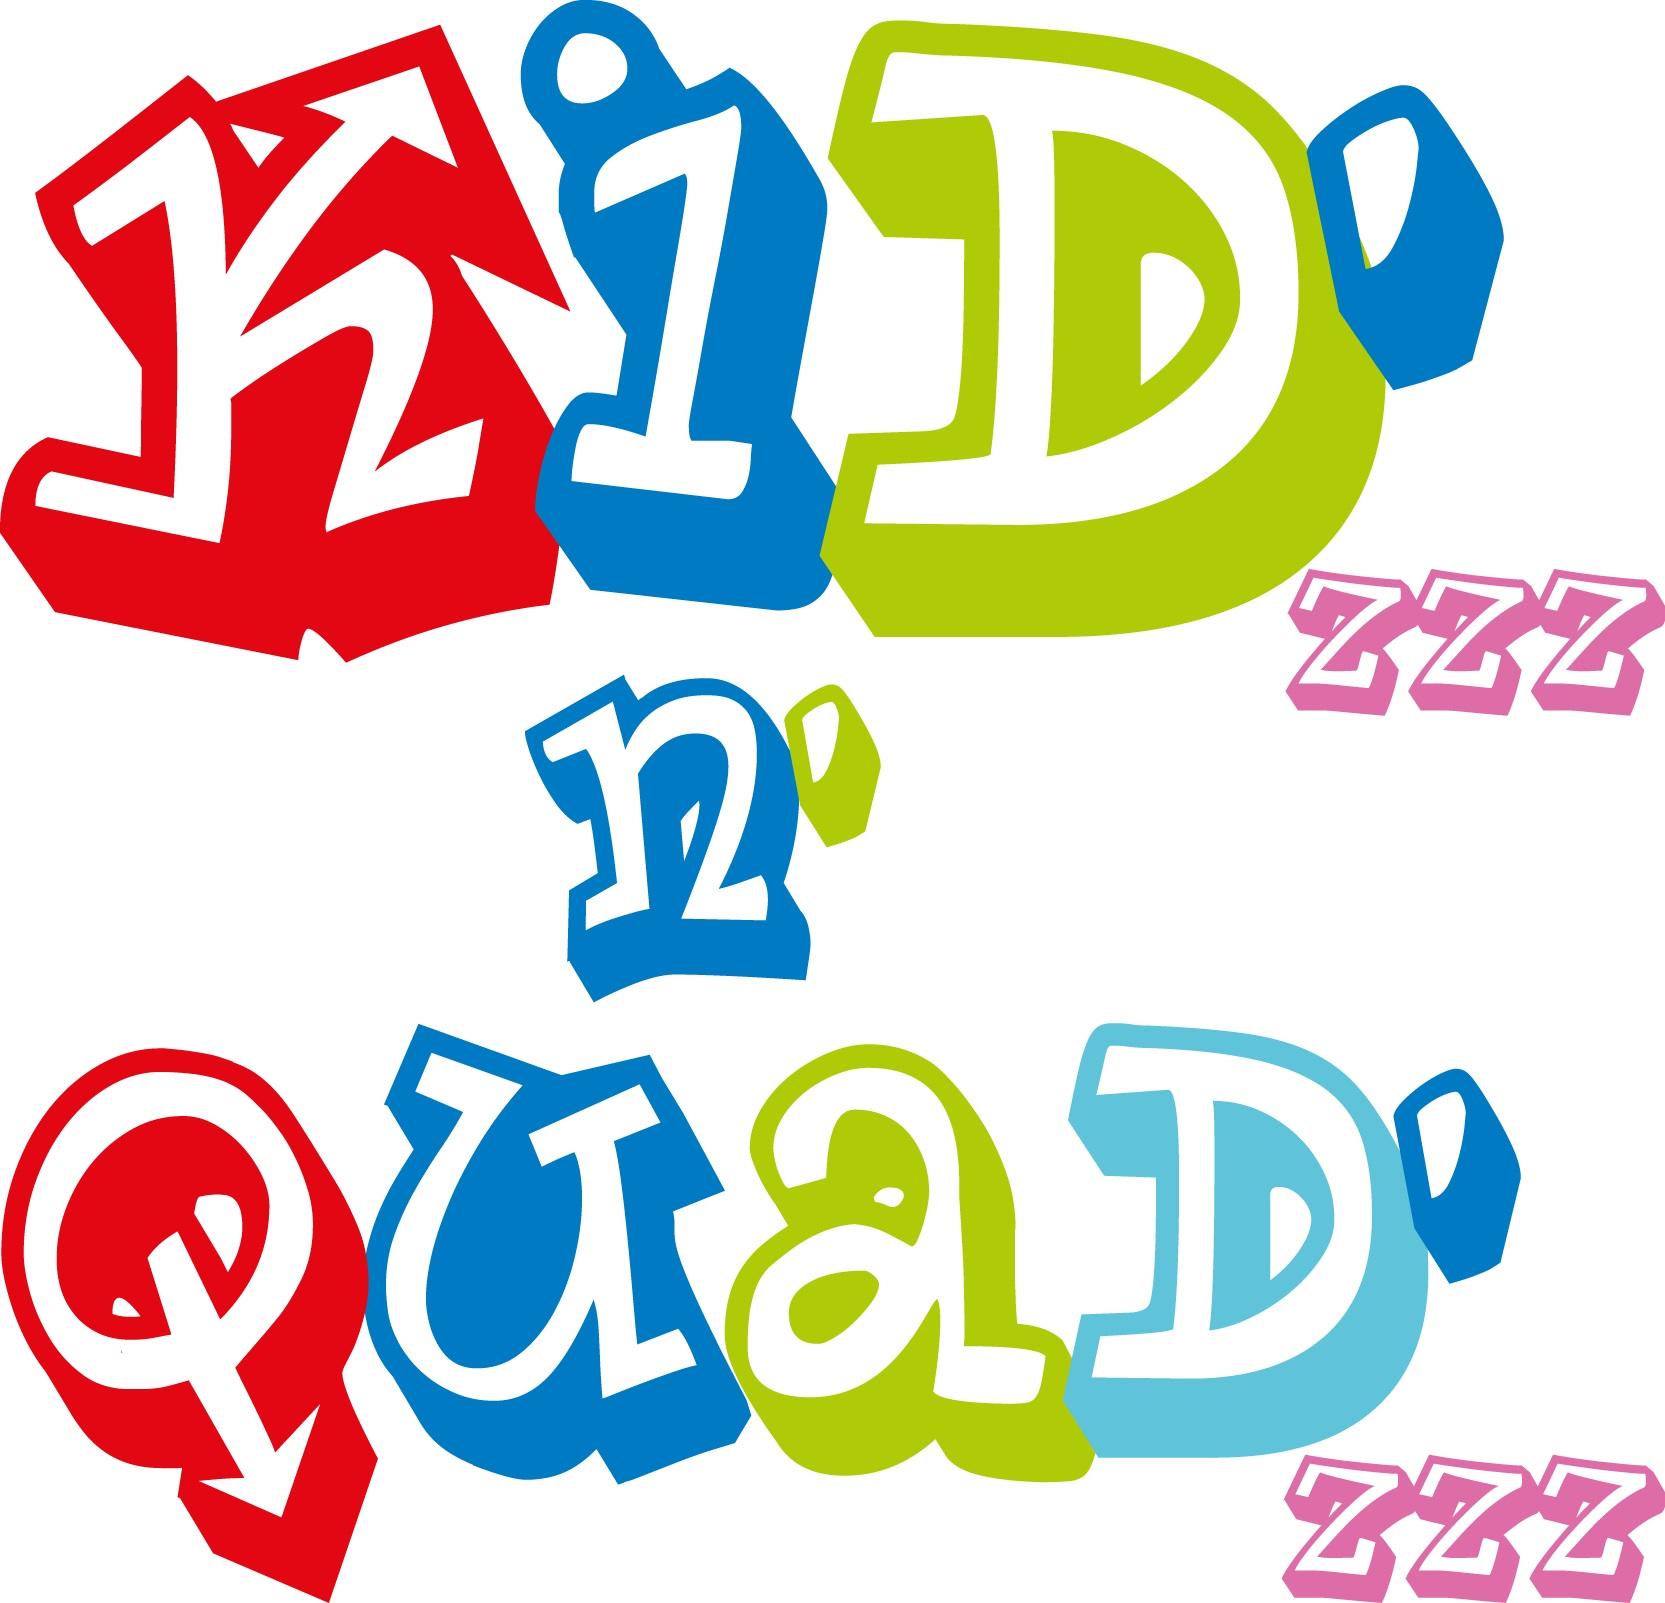 https://static.blog4ever.com/2011/09/524354/Logo-Kid--zzzNQuad--zzz.jpg